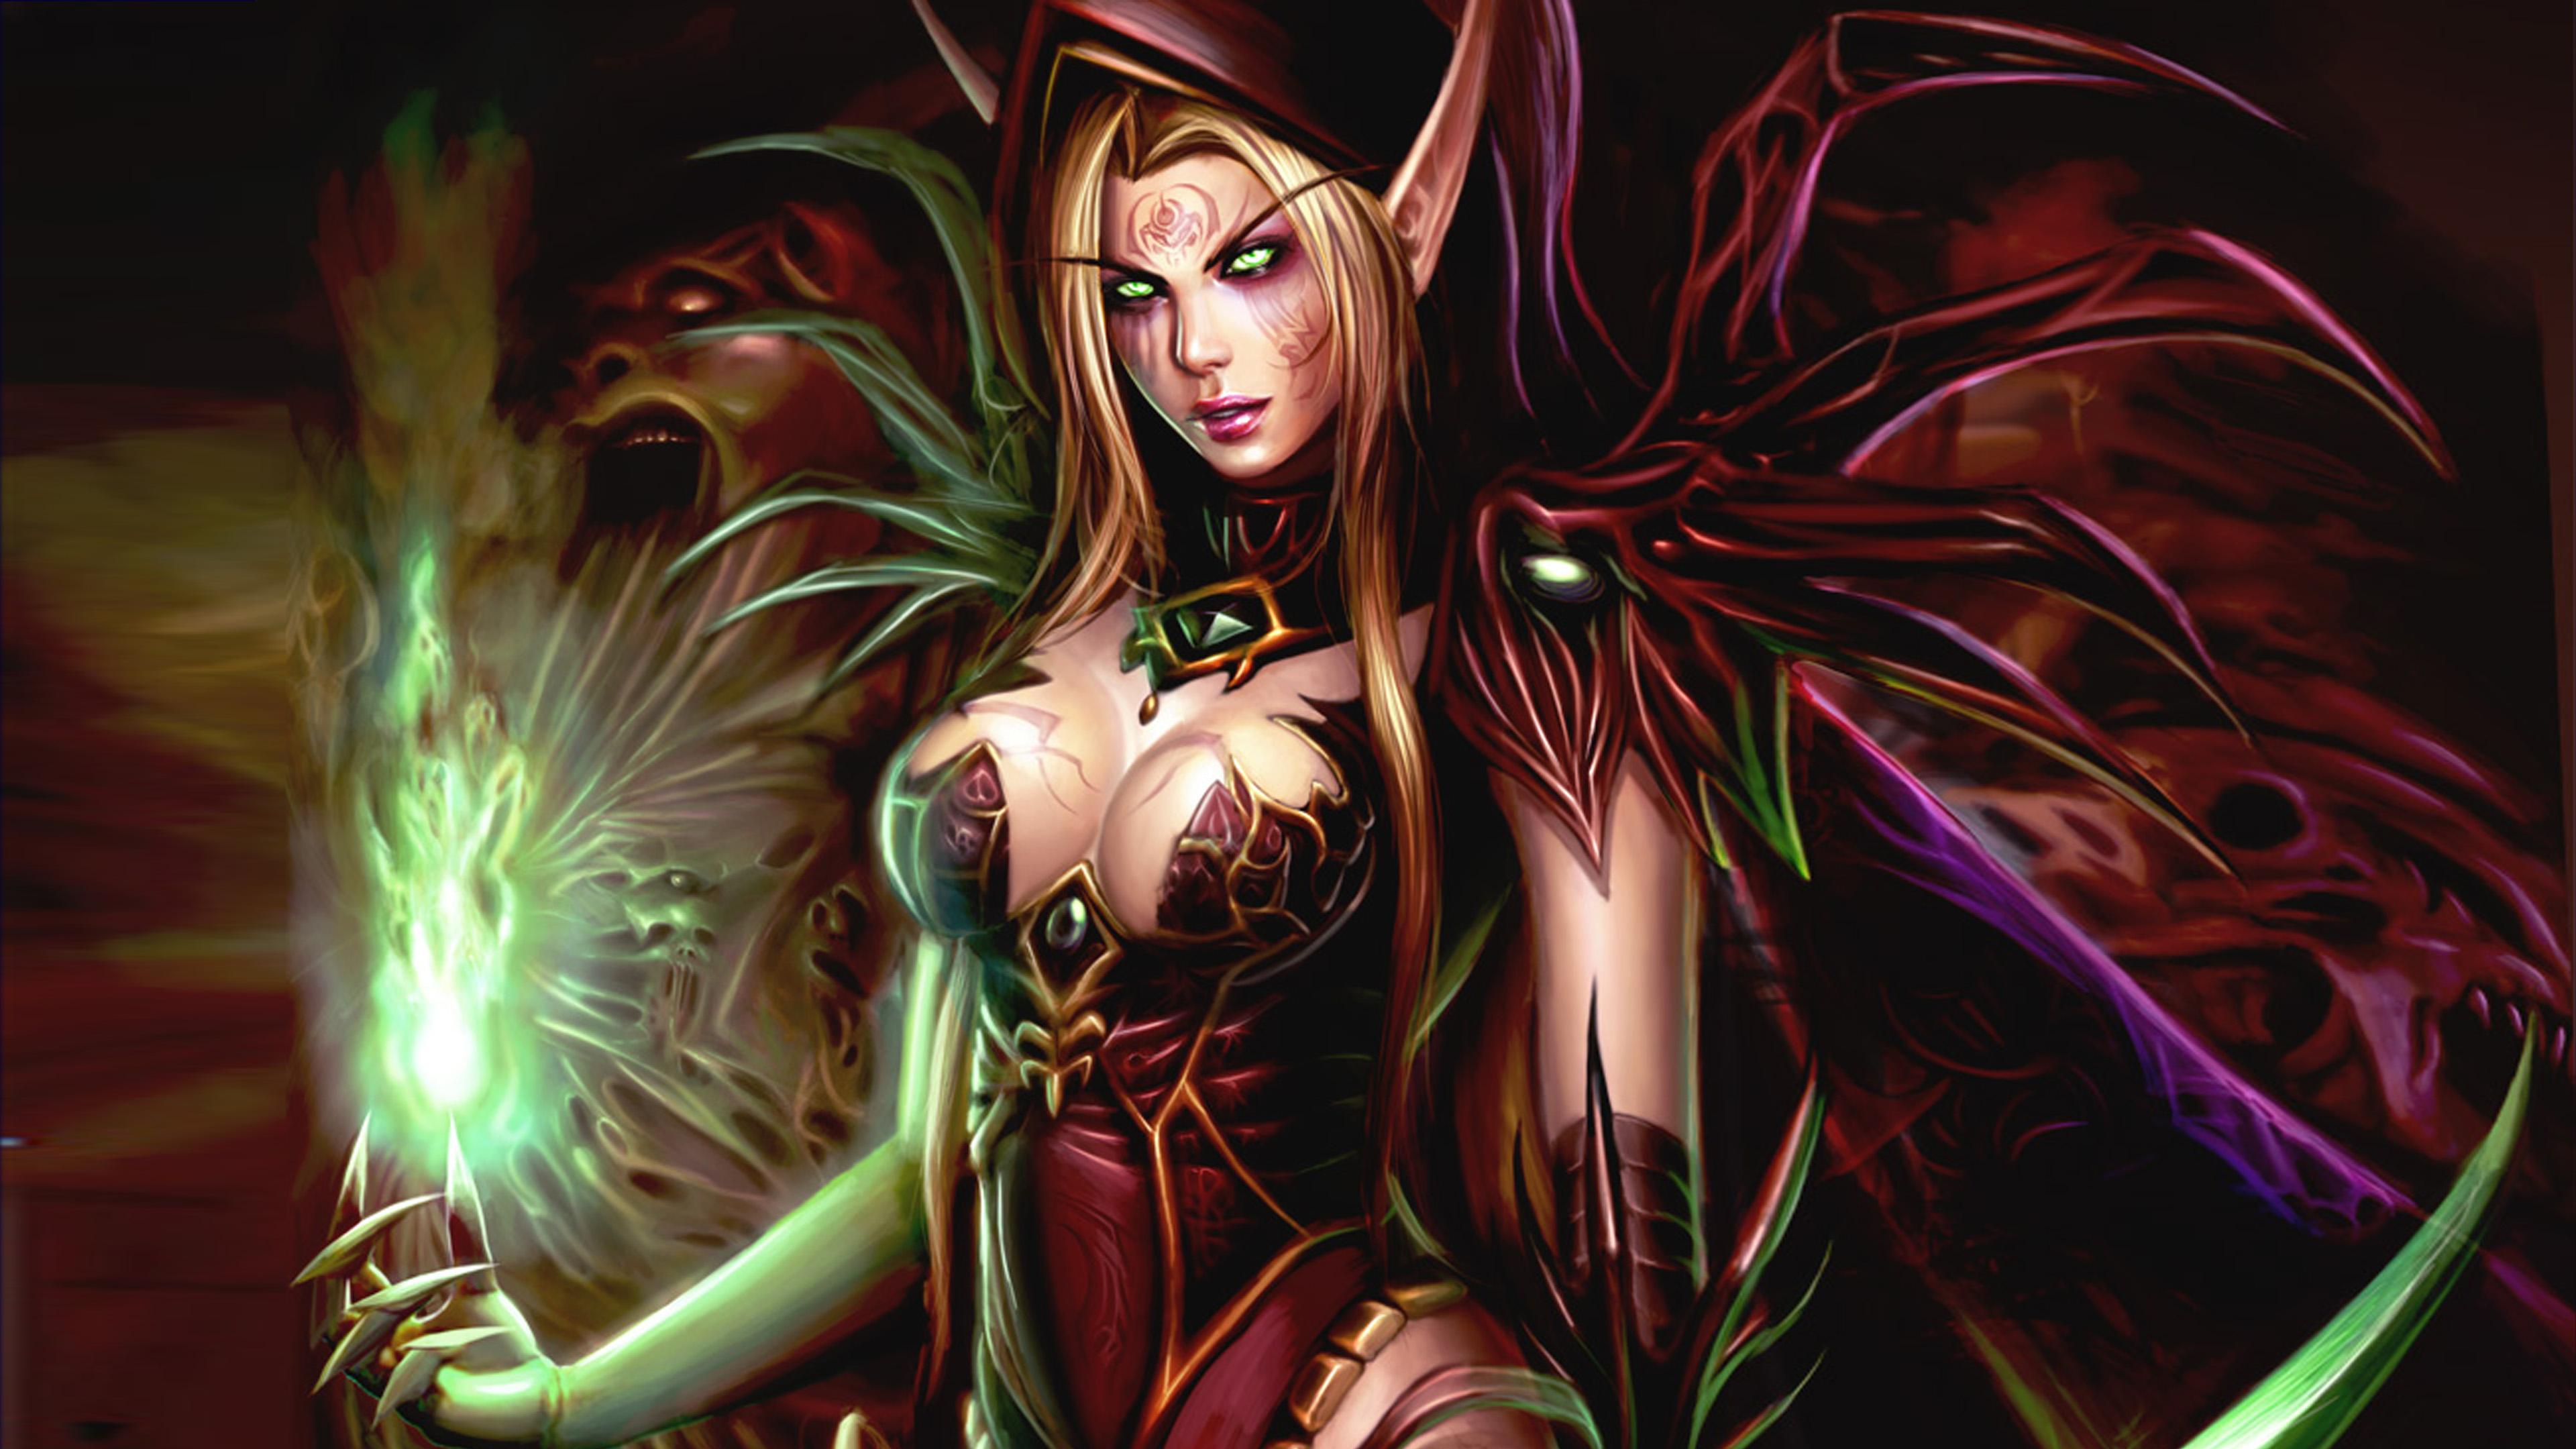 Hunter X Hunter Wallpaper Iphone World Of Warcraft Video Game Female Characters Valeera